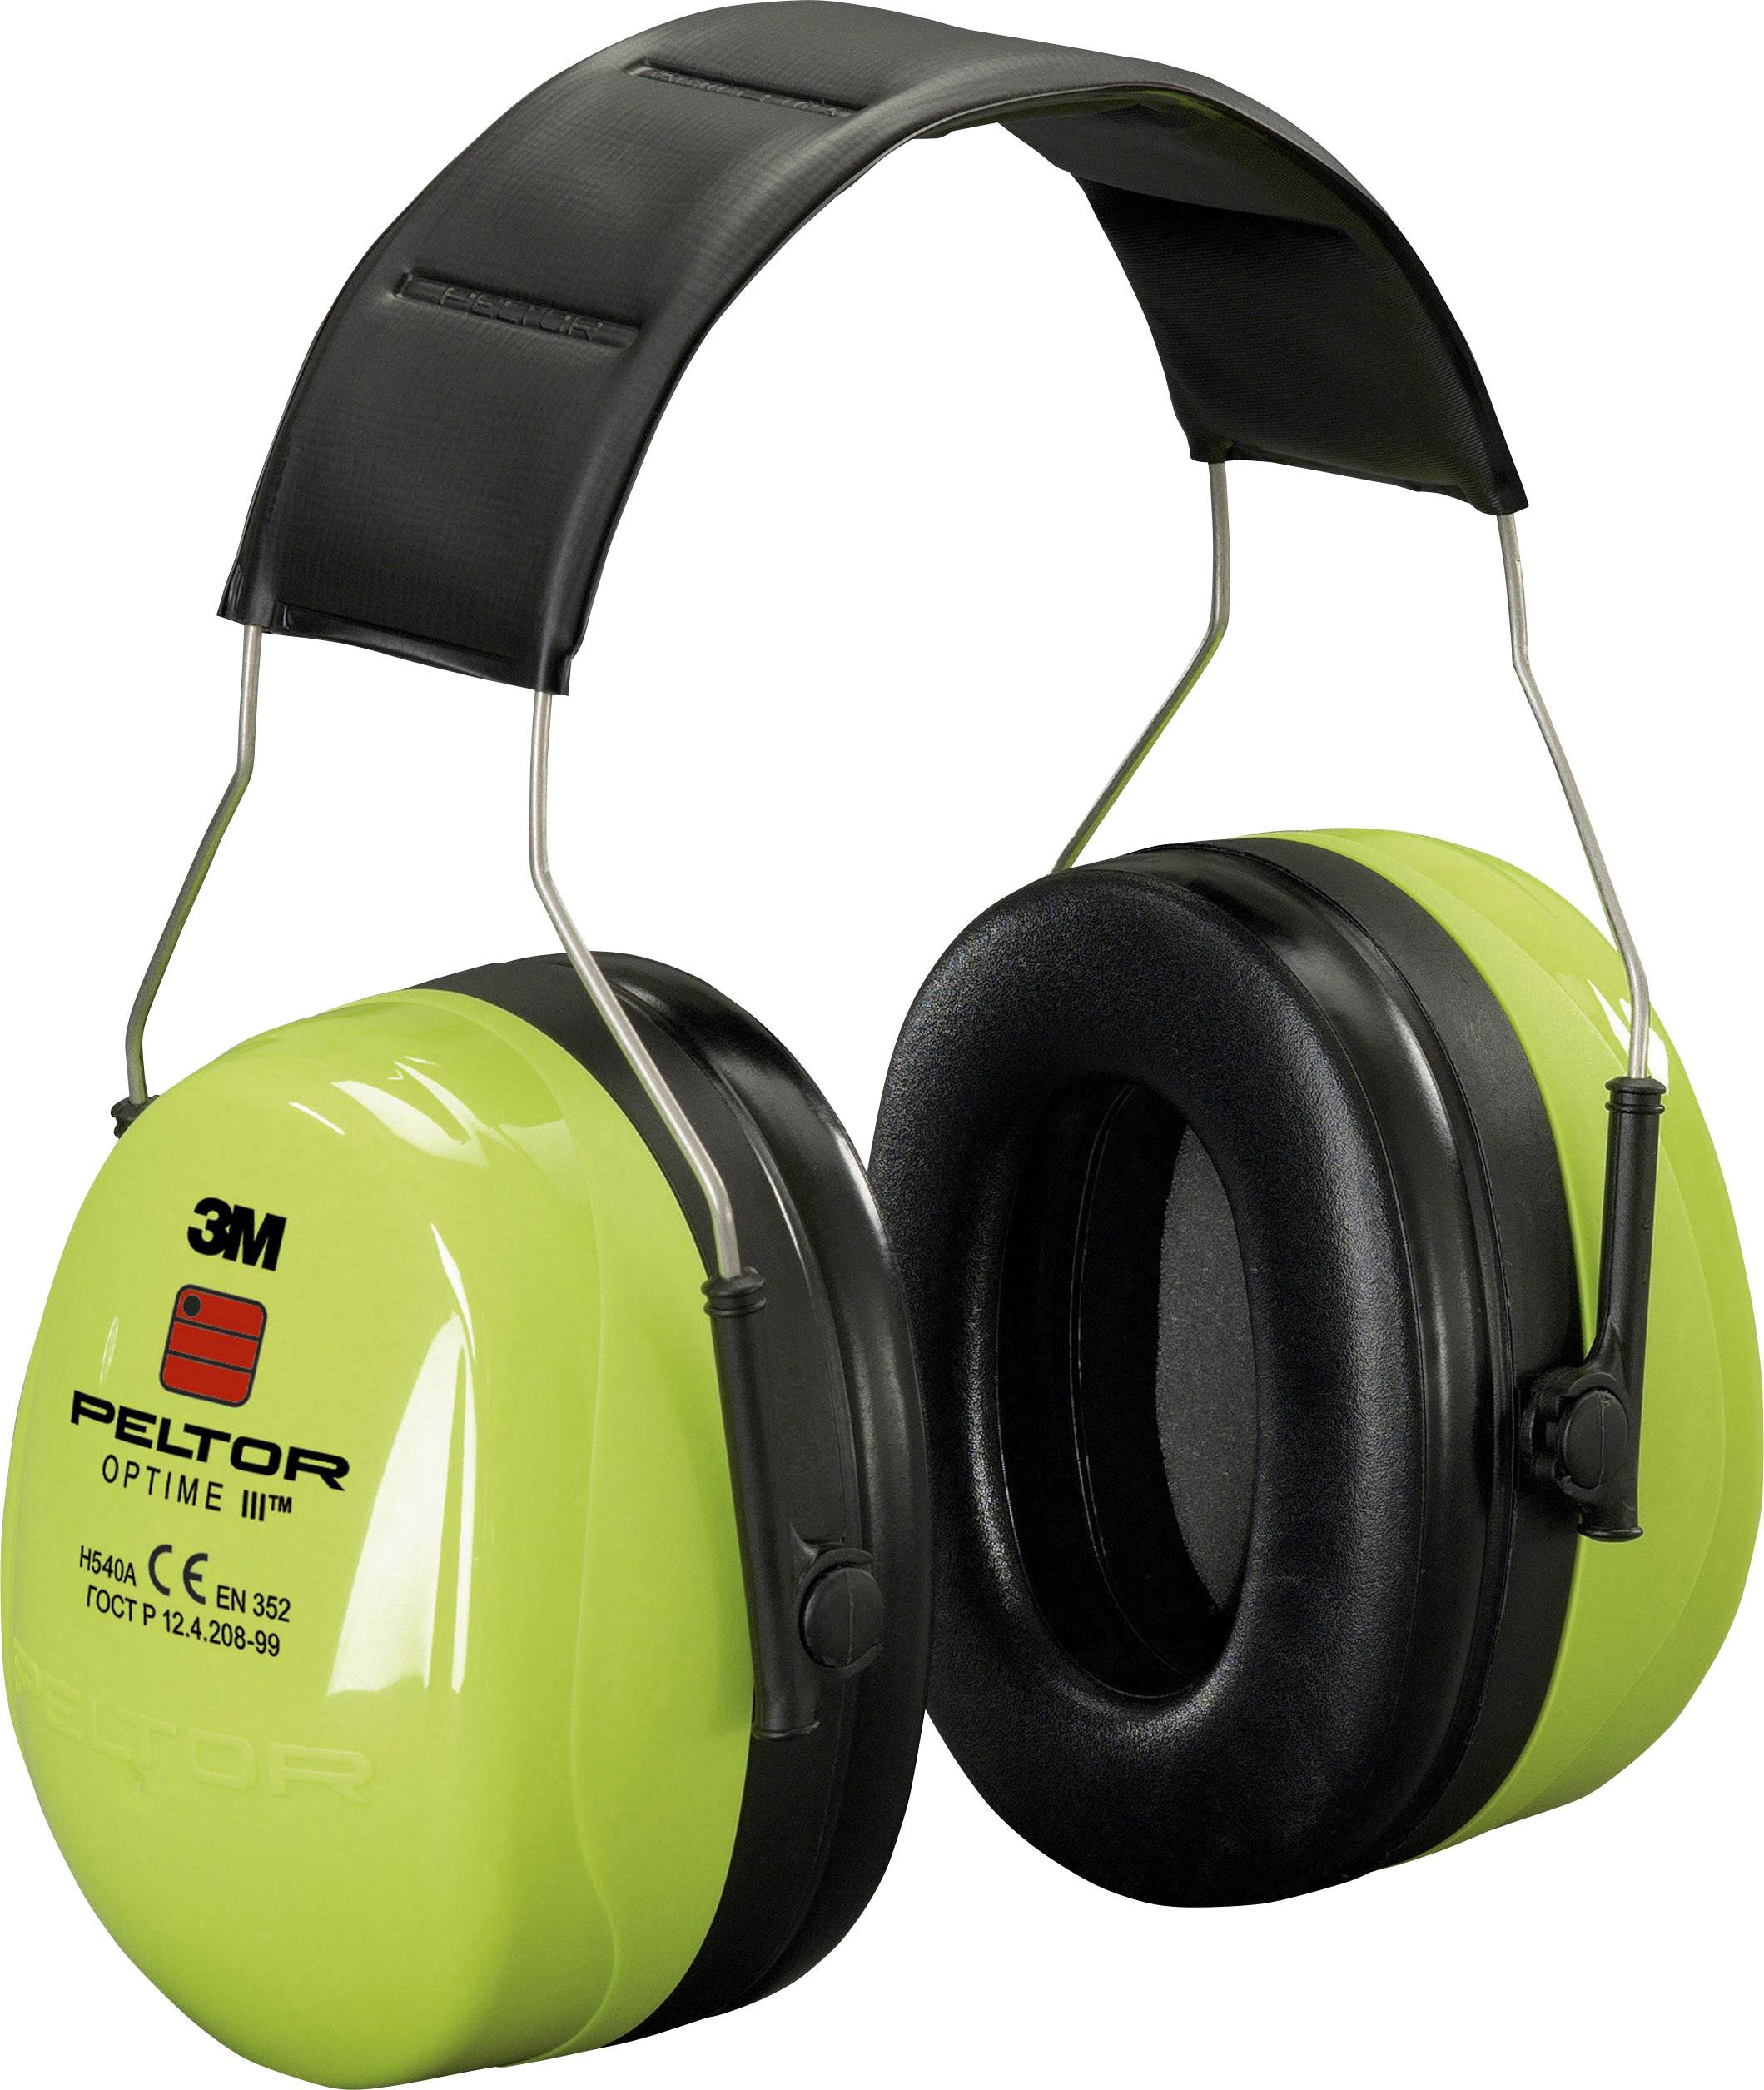 Mušlový chránič sluchu Peltor Optime III HVS H540AV, 35 dB, 1 ks